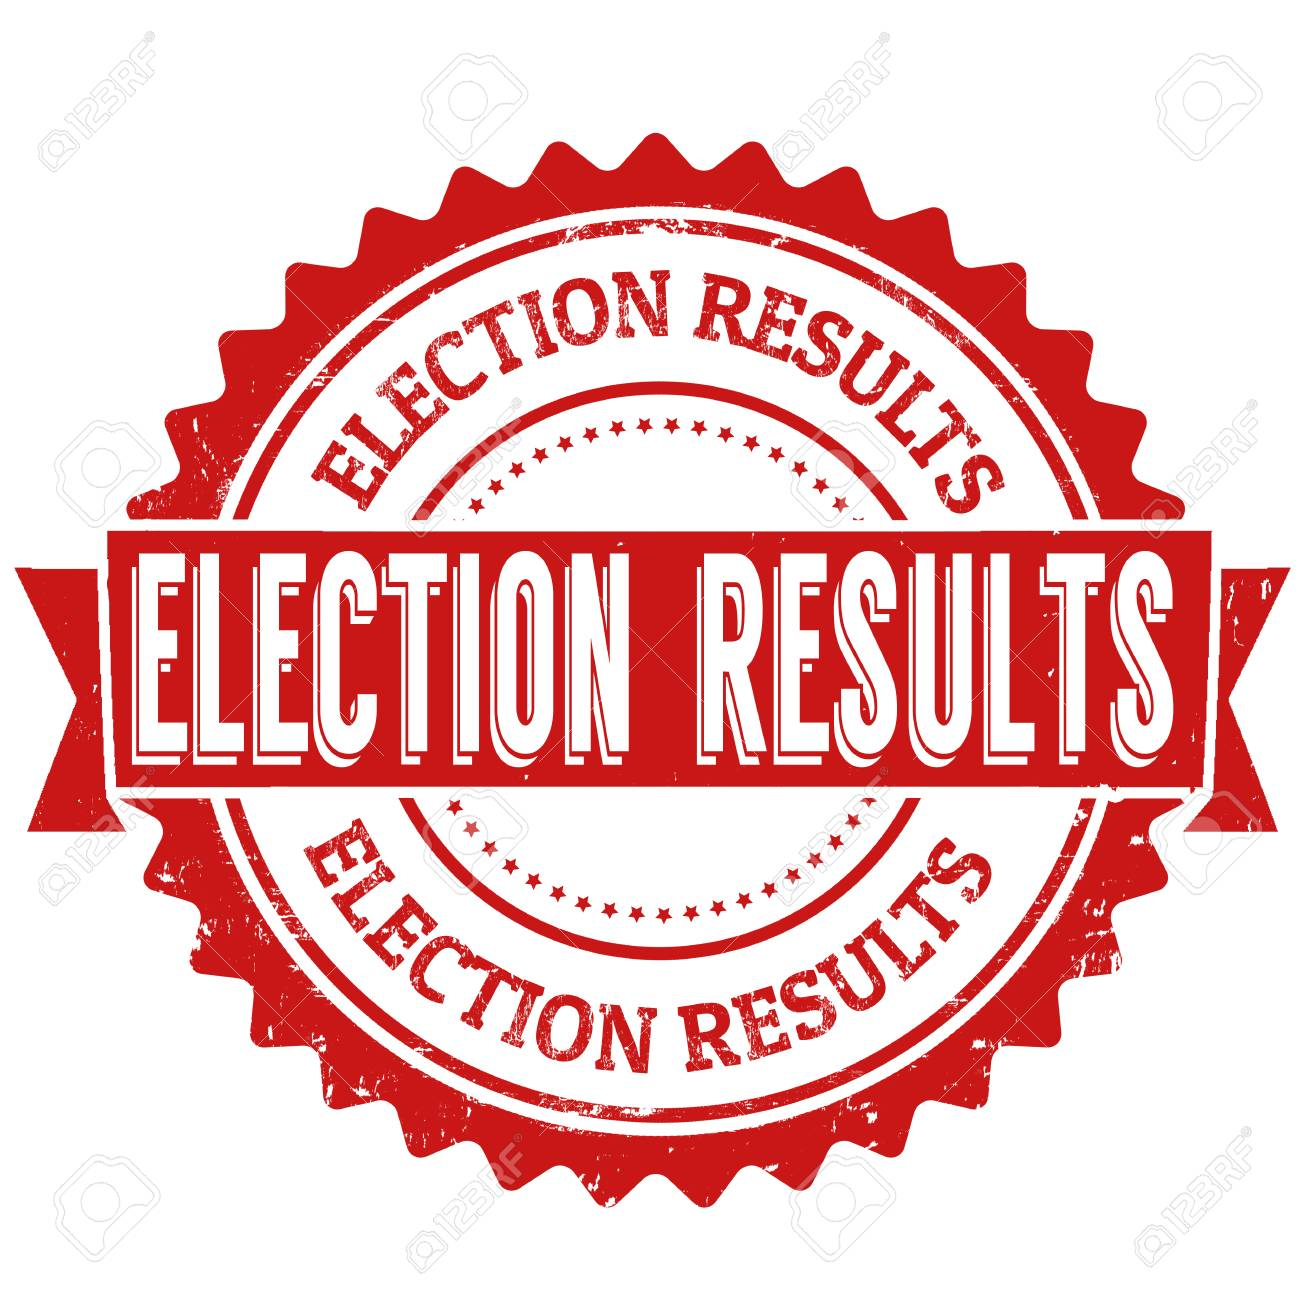 Election results grunge rubber stamp on white backround, vector illustration - 60756444